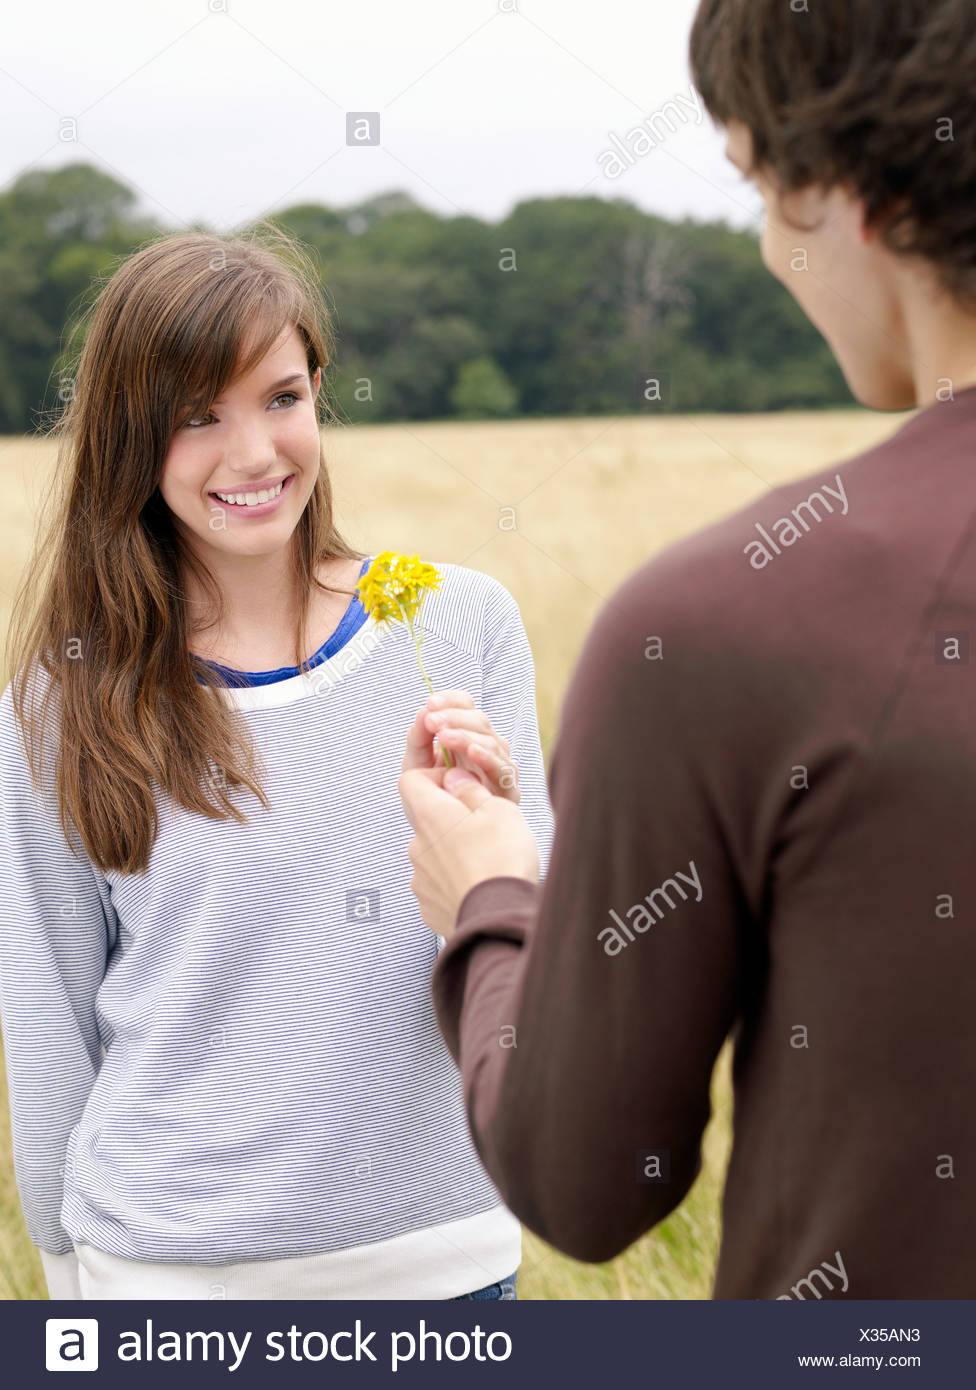 Boy giving girl a flower - Stock Image